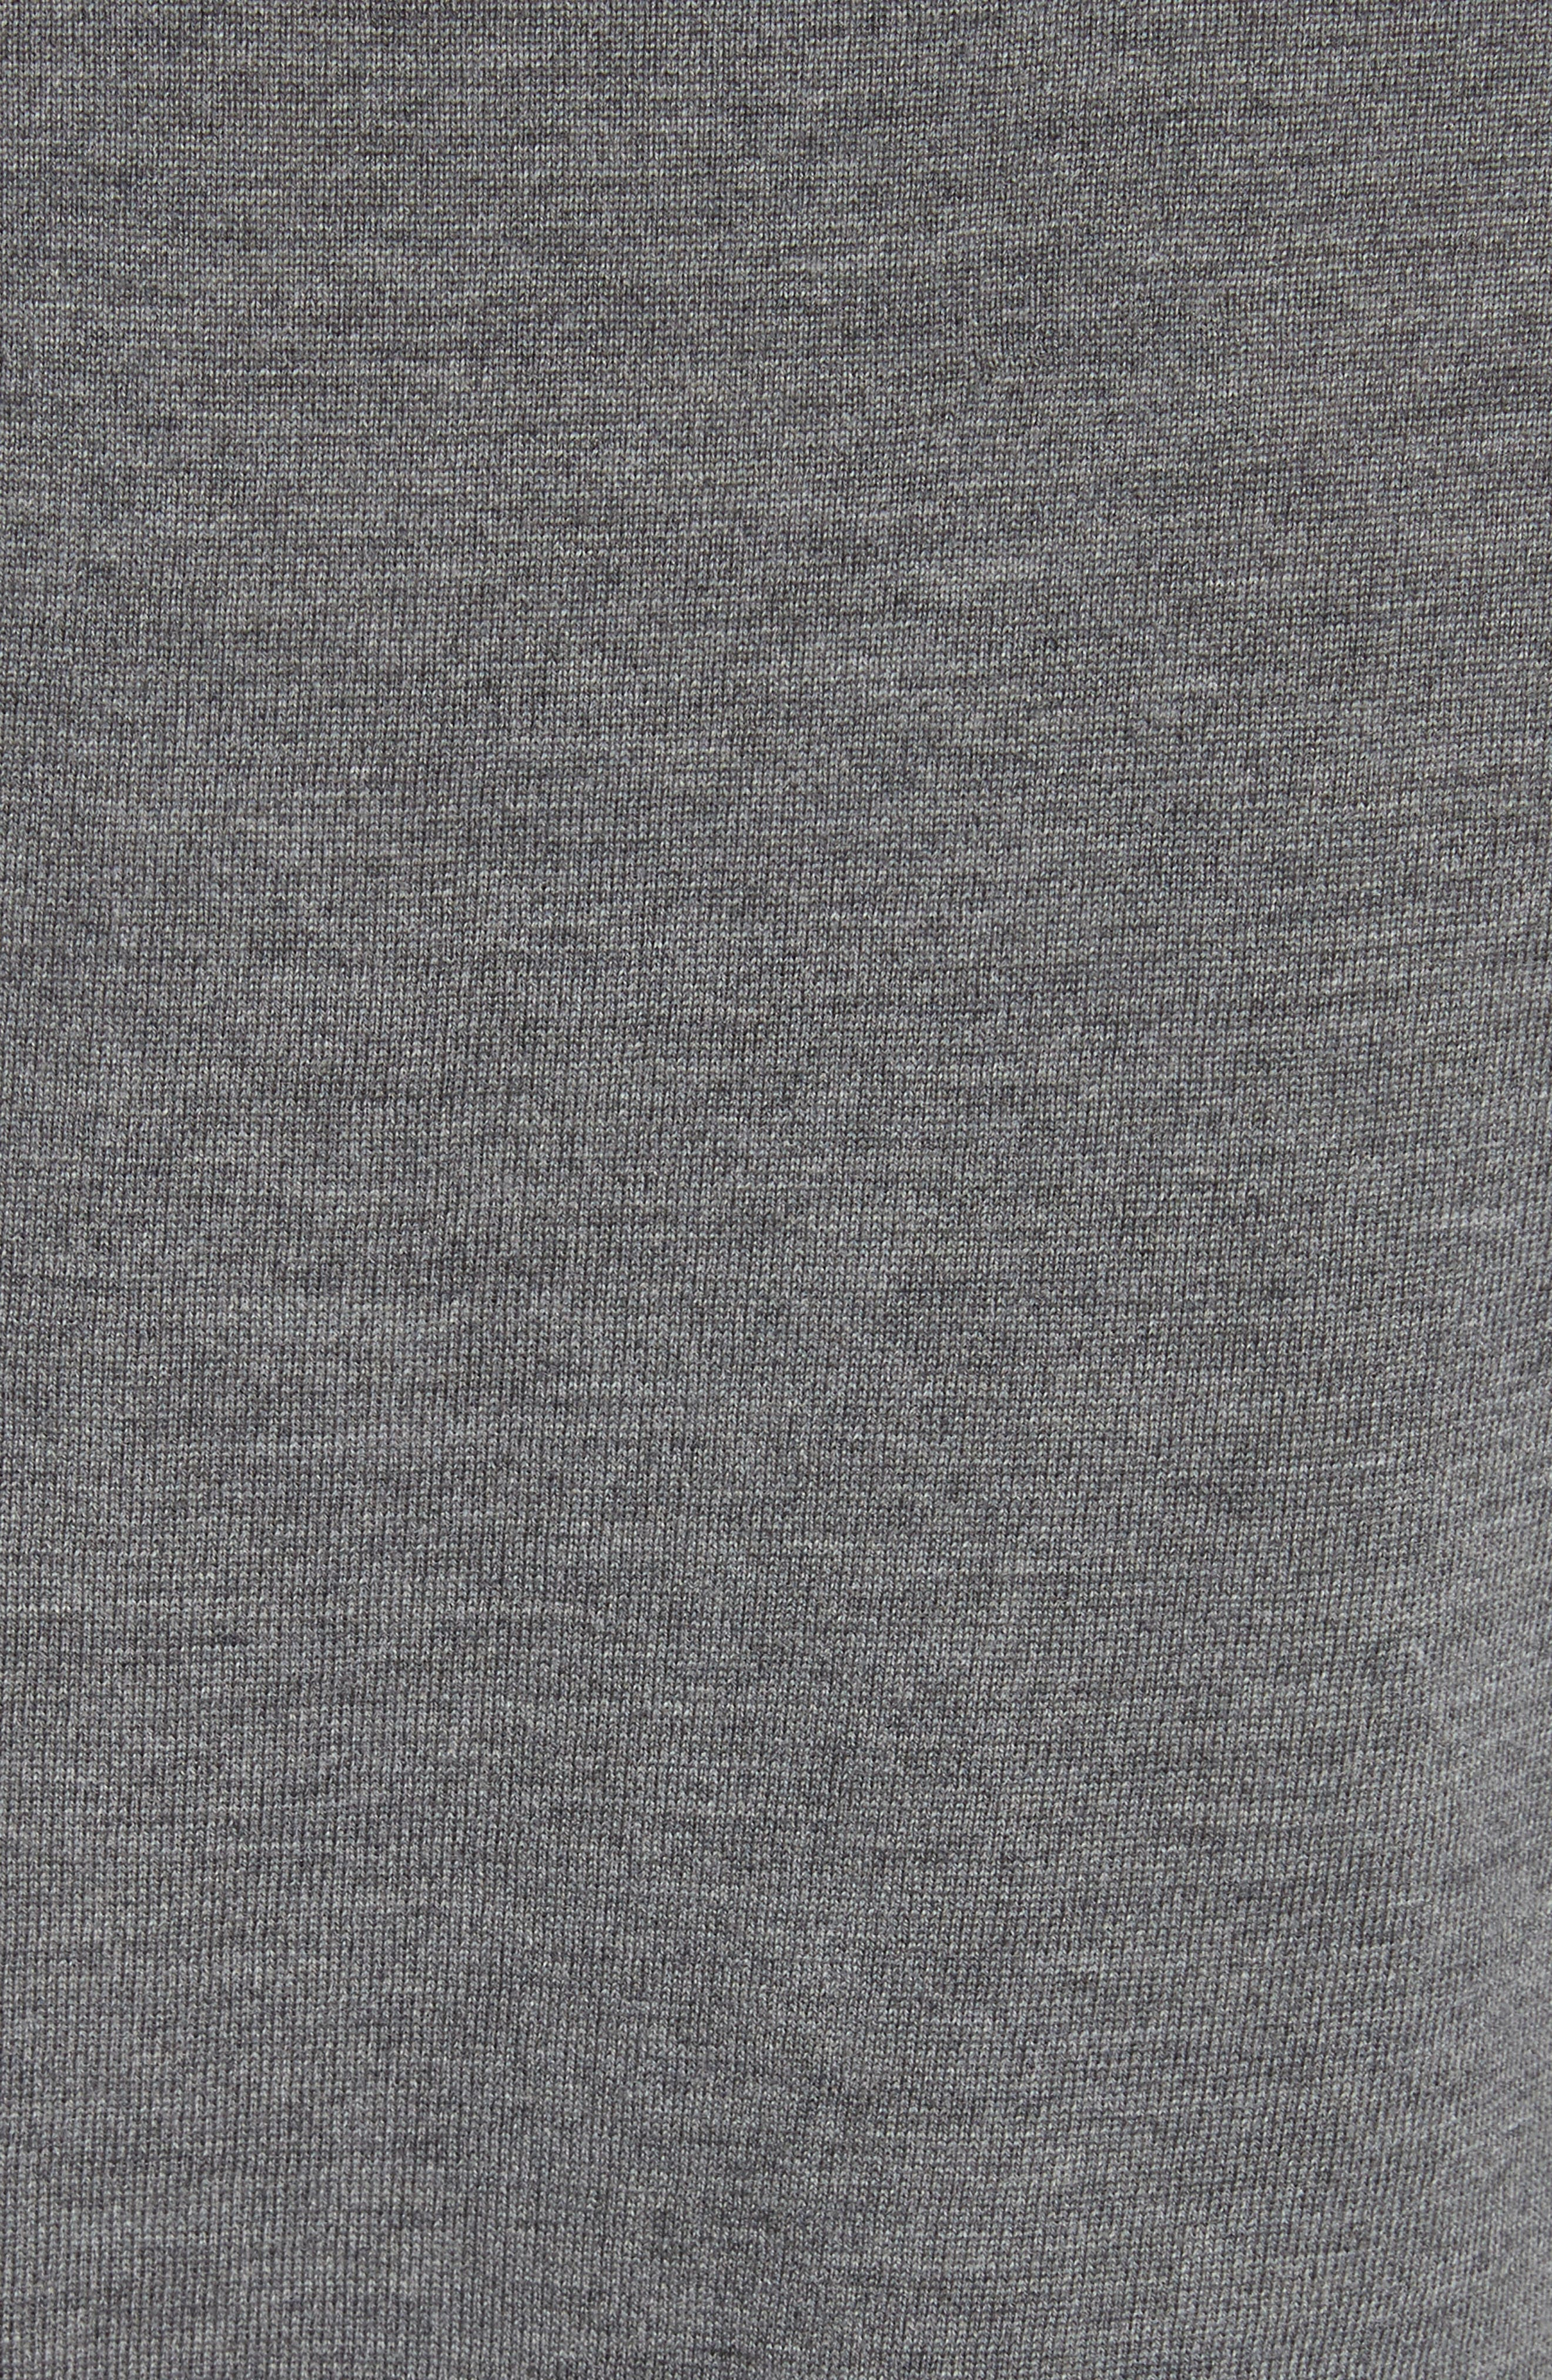 Ruffle Merino Wool Sweater,                             Alternate thumbnail 5, color,                             Dark Grey Melange